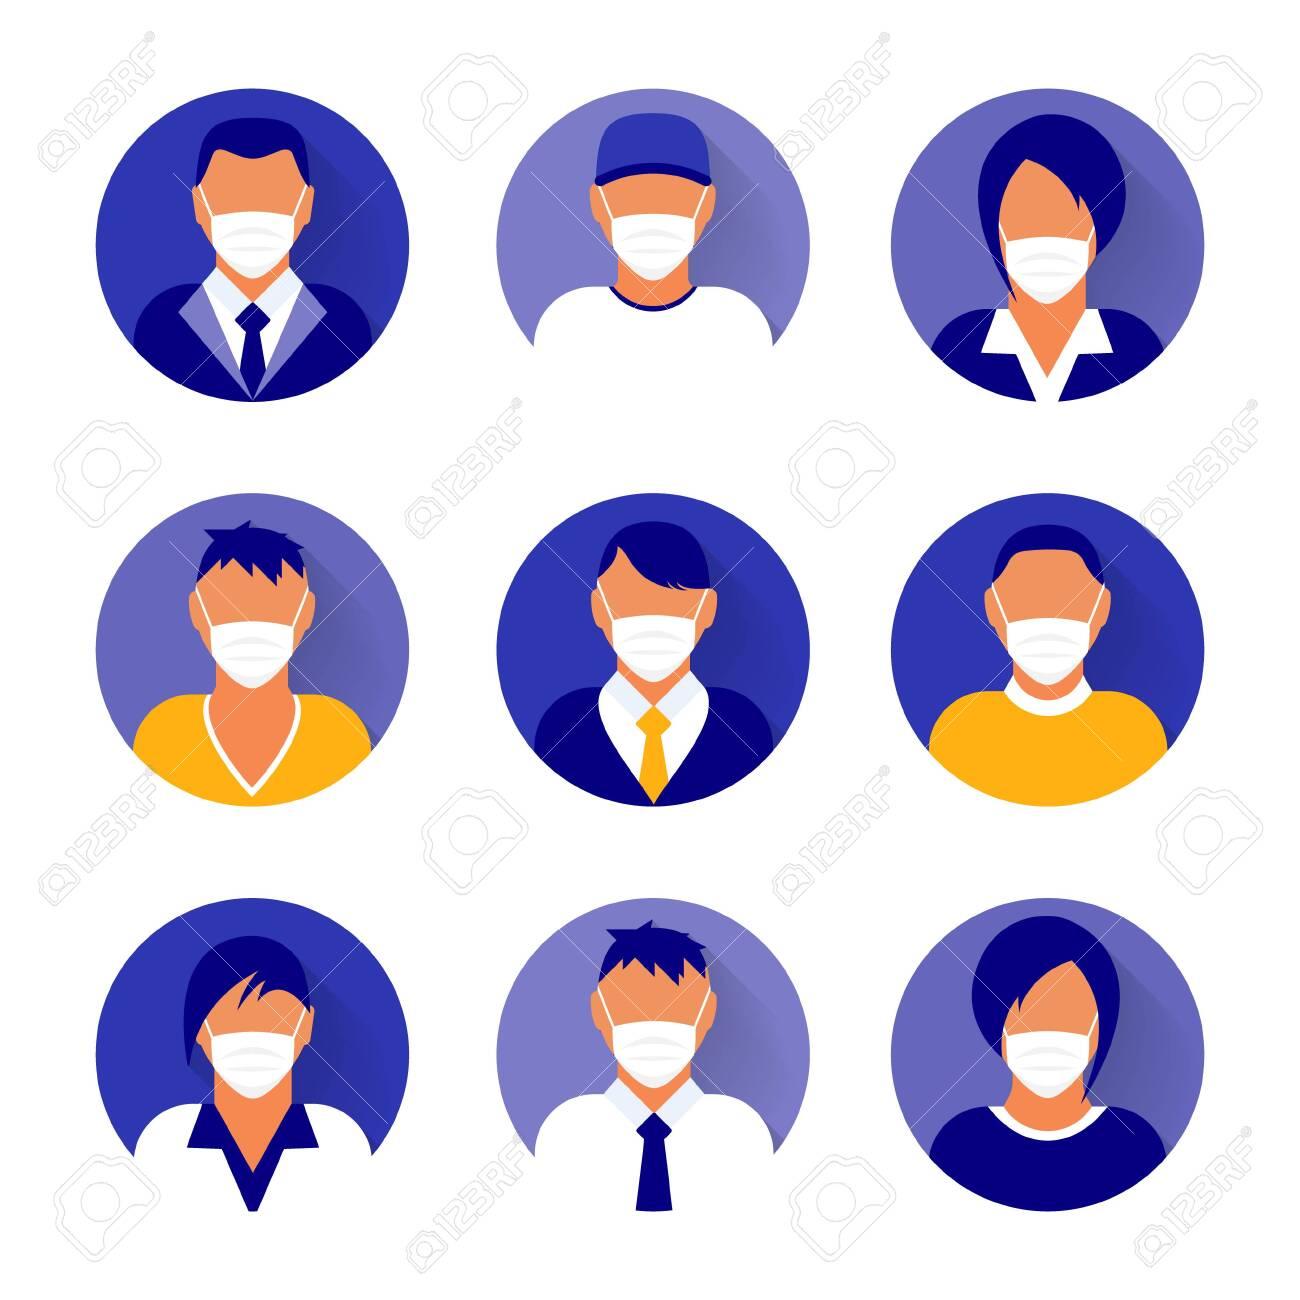 Flat modern minimal avatar icons with medical mask. - 143227824